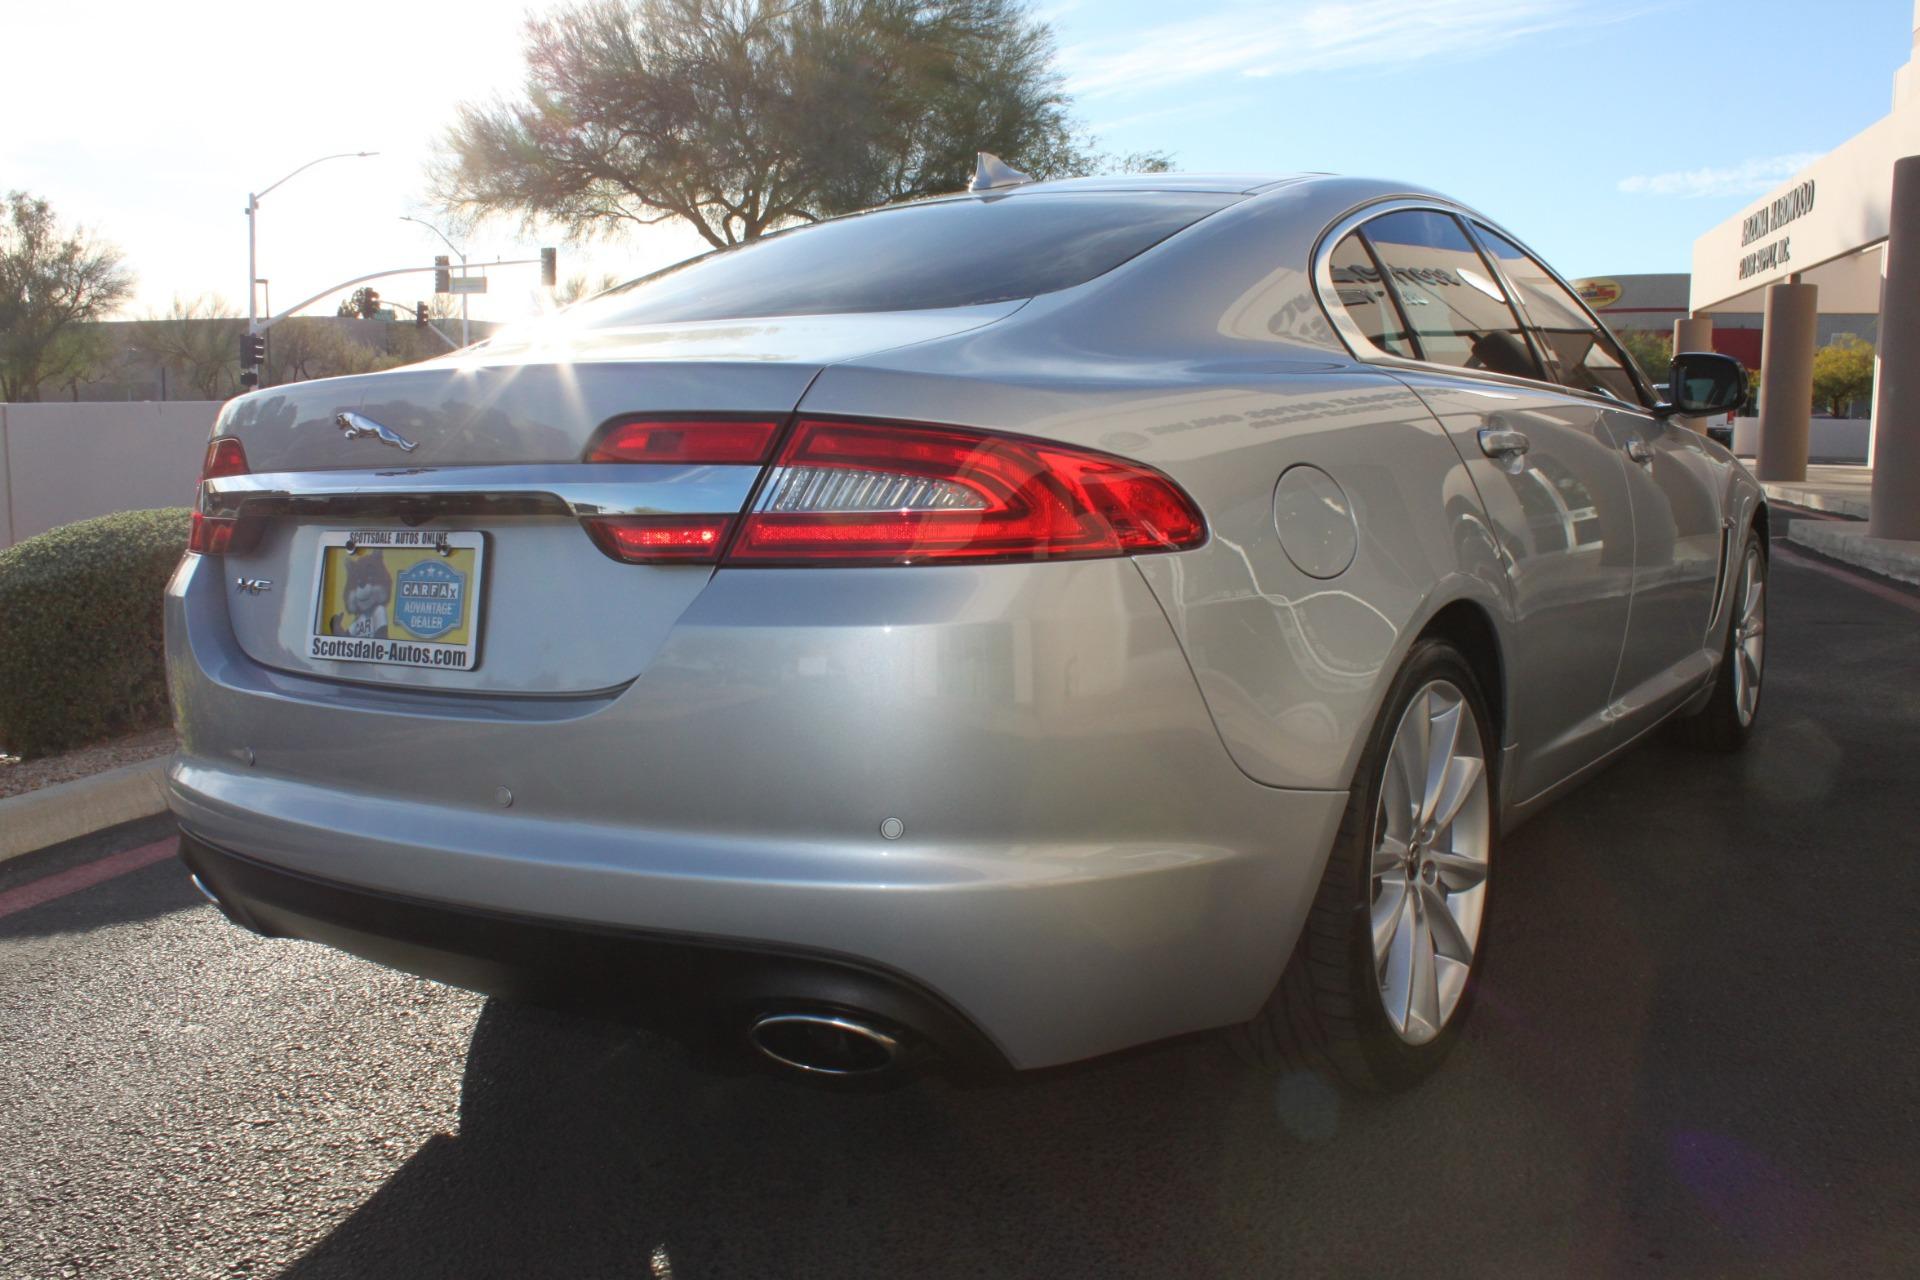 Used-2013-Jaguar-XF-I4-RWD-Classic